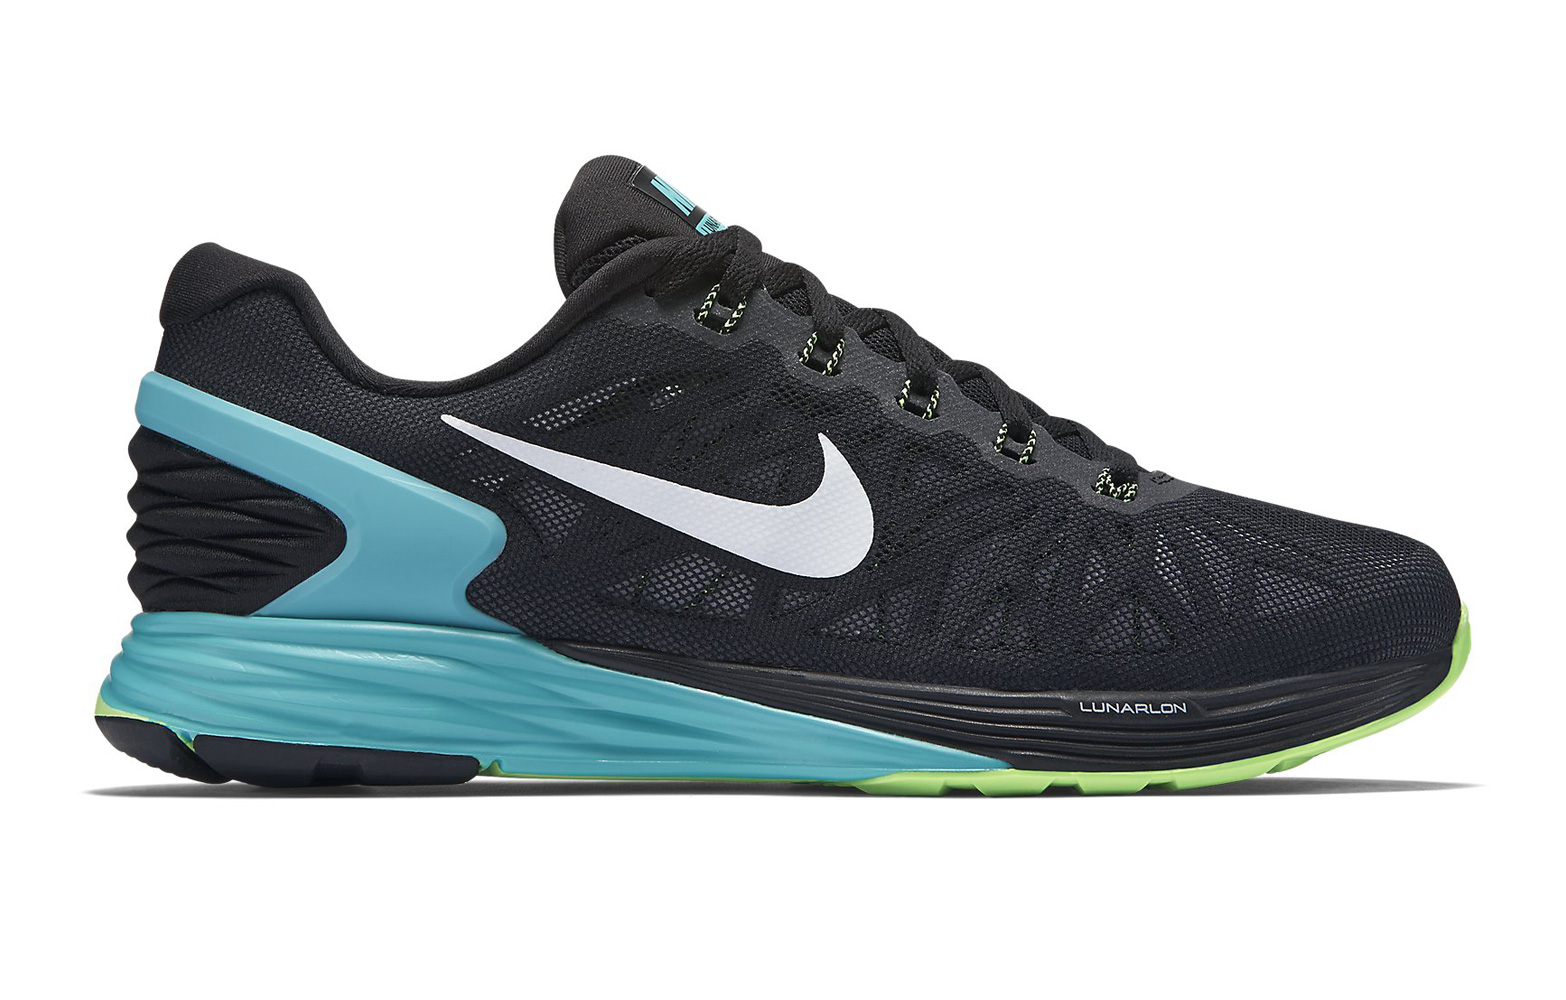 sports shoes 7bc9f d9553 Chaussures de Running Nike LUNARGLIDE 6